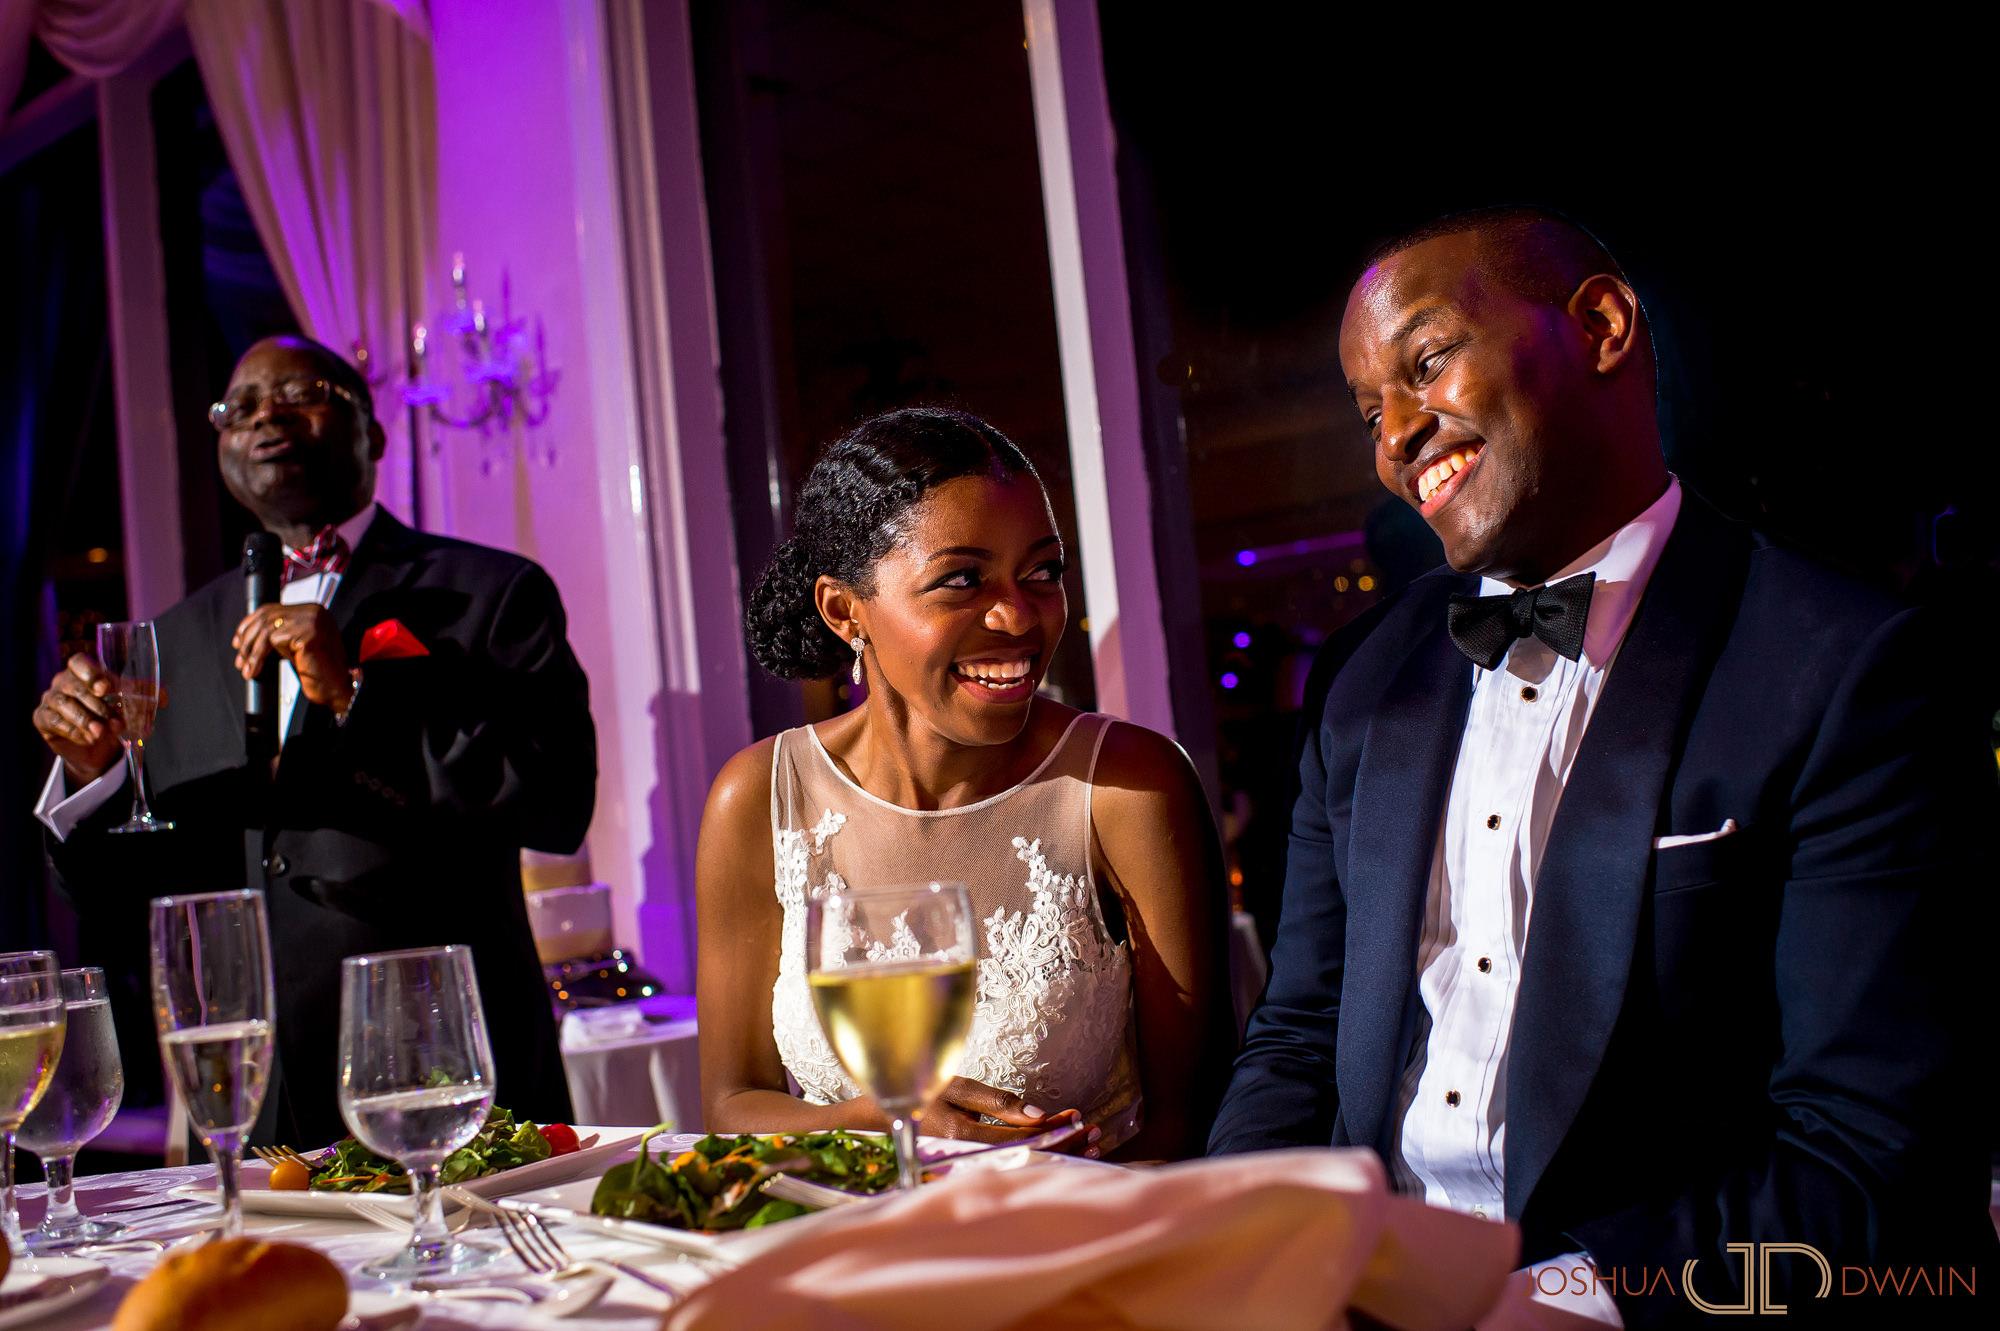 Tina & Jean Claude Wedding at Greentree Country Club